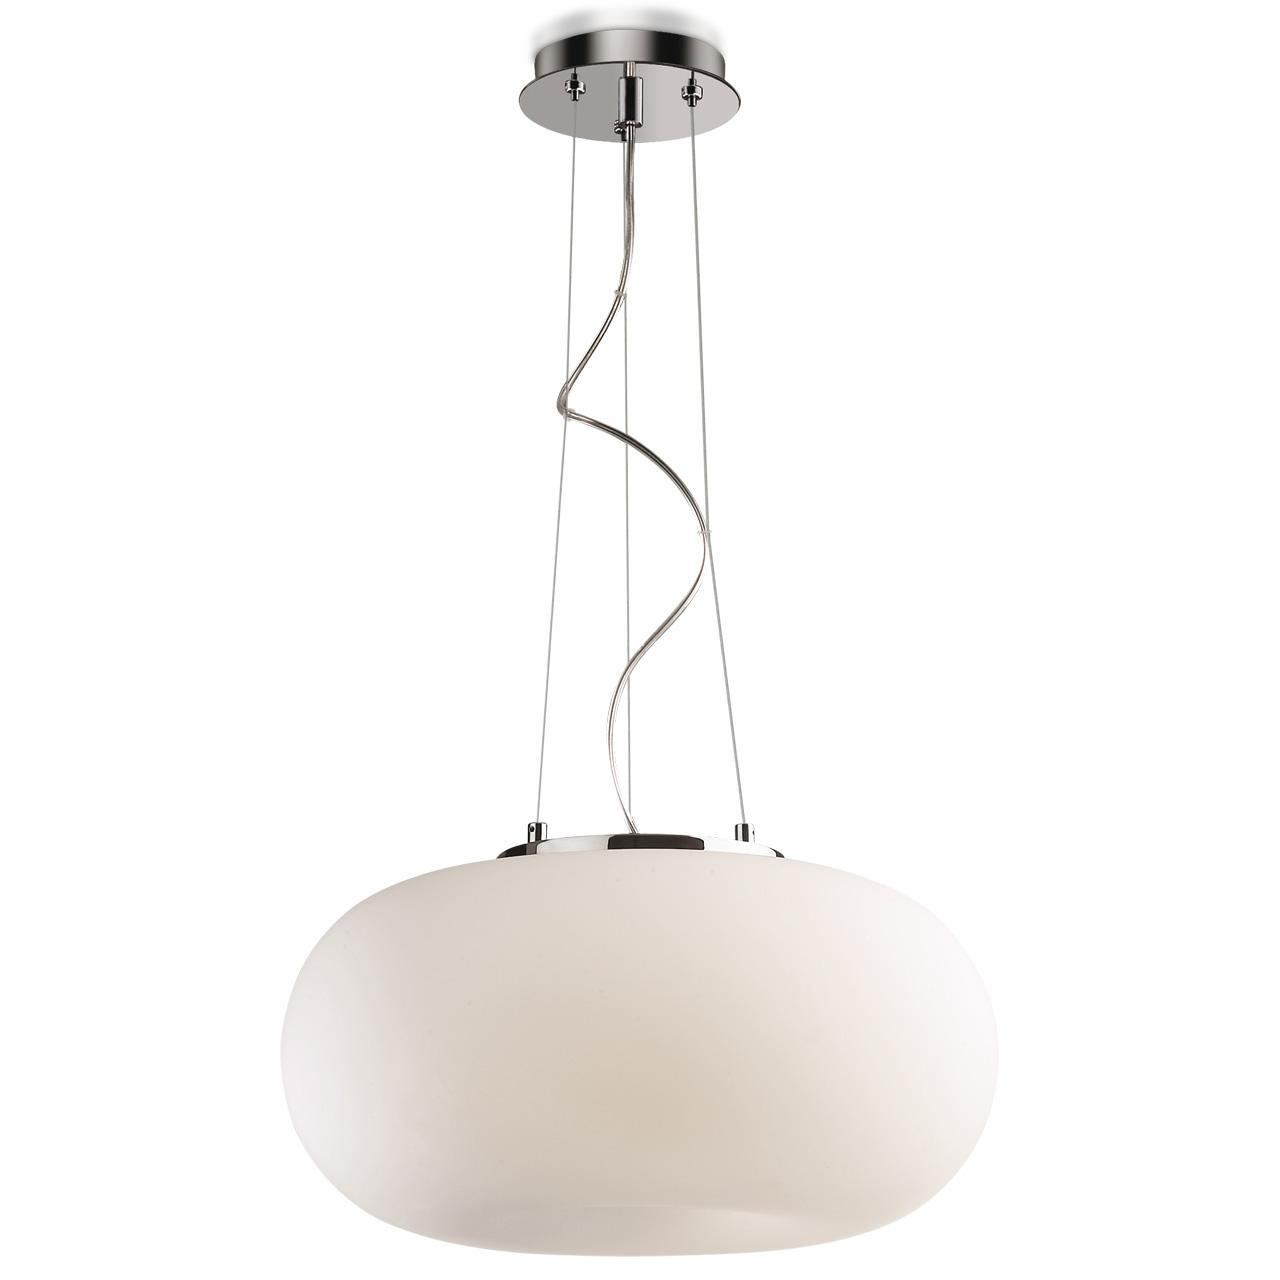 Подвесной светильник Odeon Light Pati 2205/3B цены онлайн